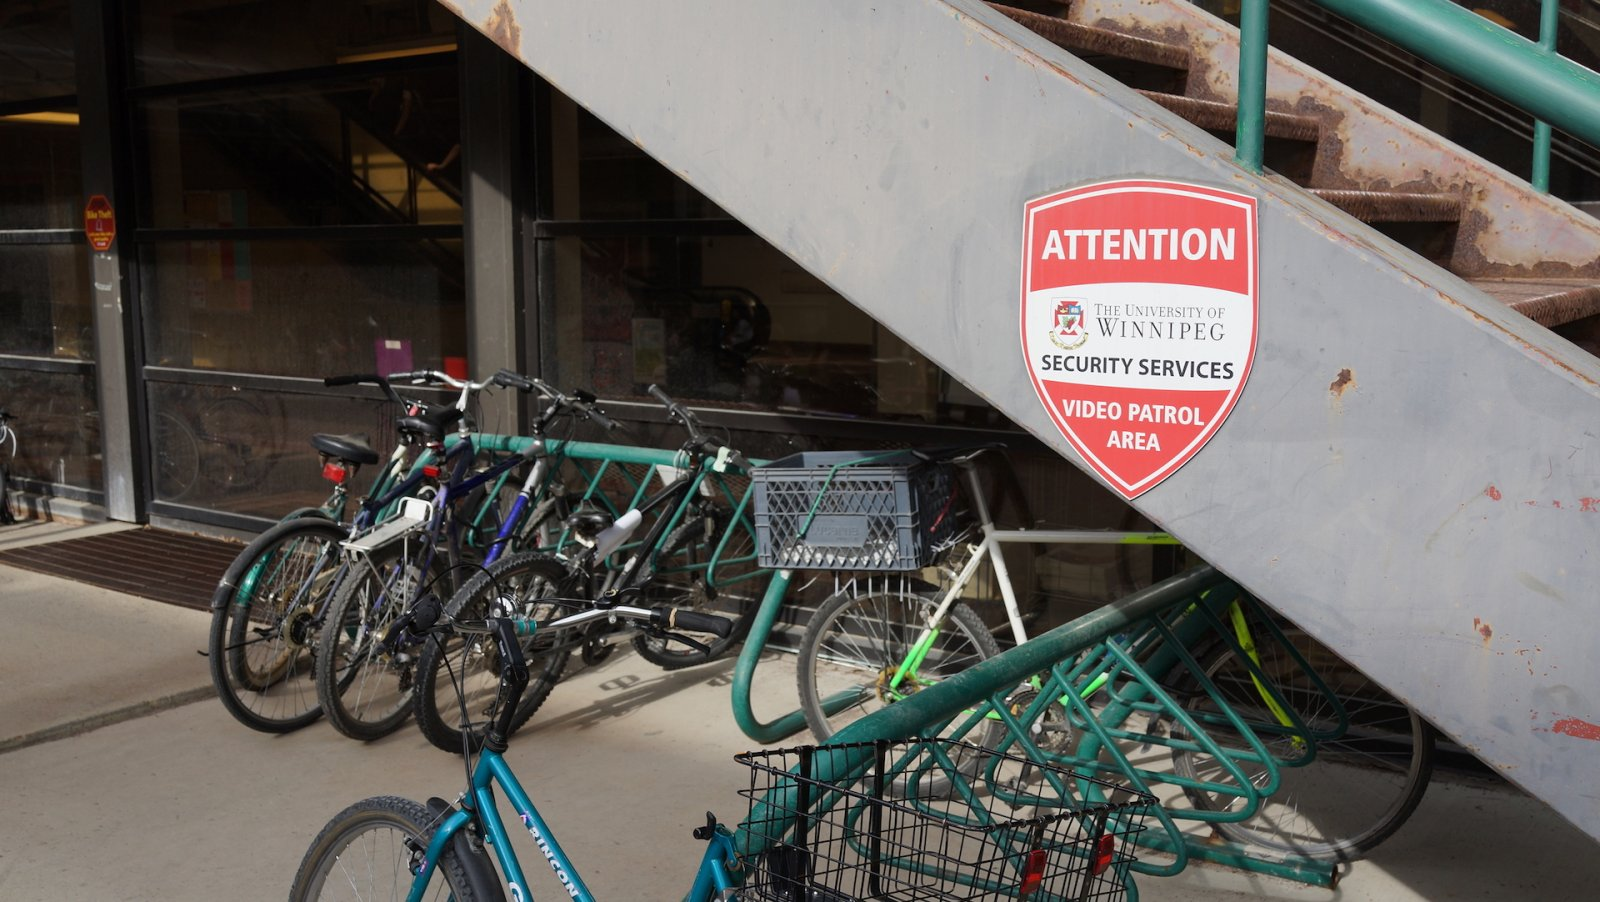 The University of Winnipeg - bikes and Sequrity, Winnipeg, Rospersonal.JPG